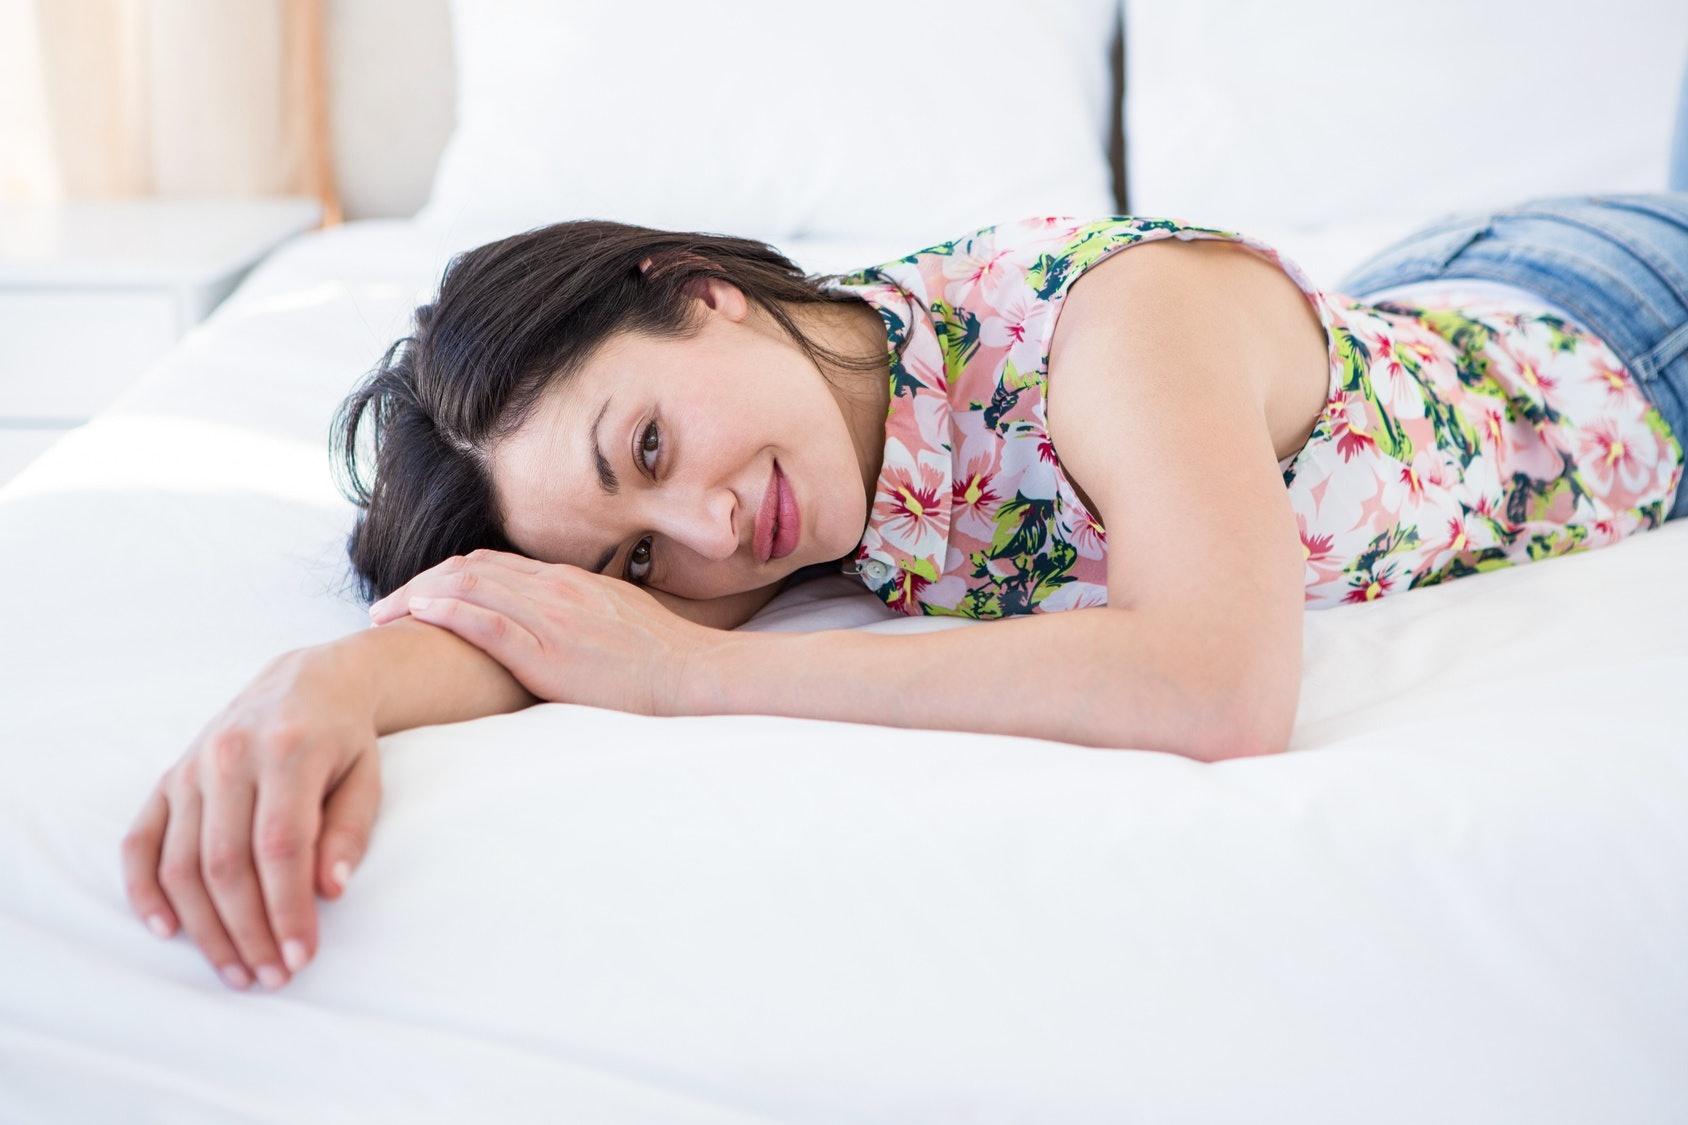 cervix dilation bdsm